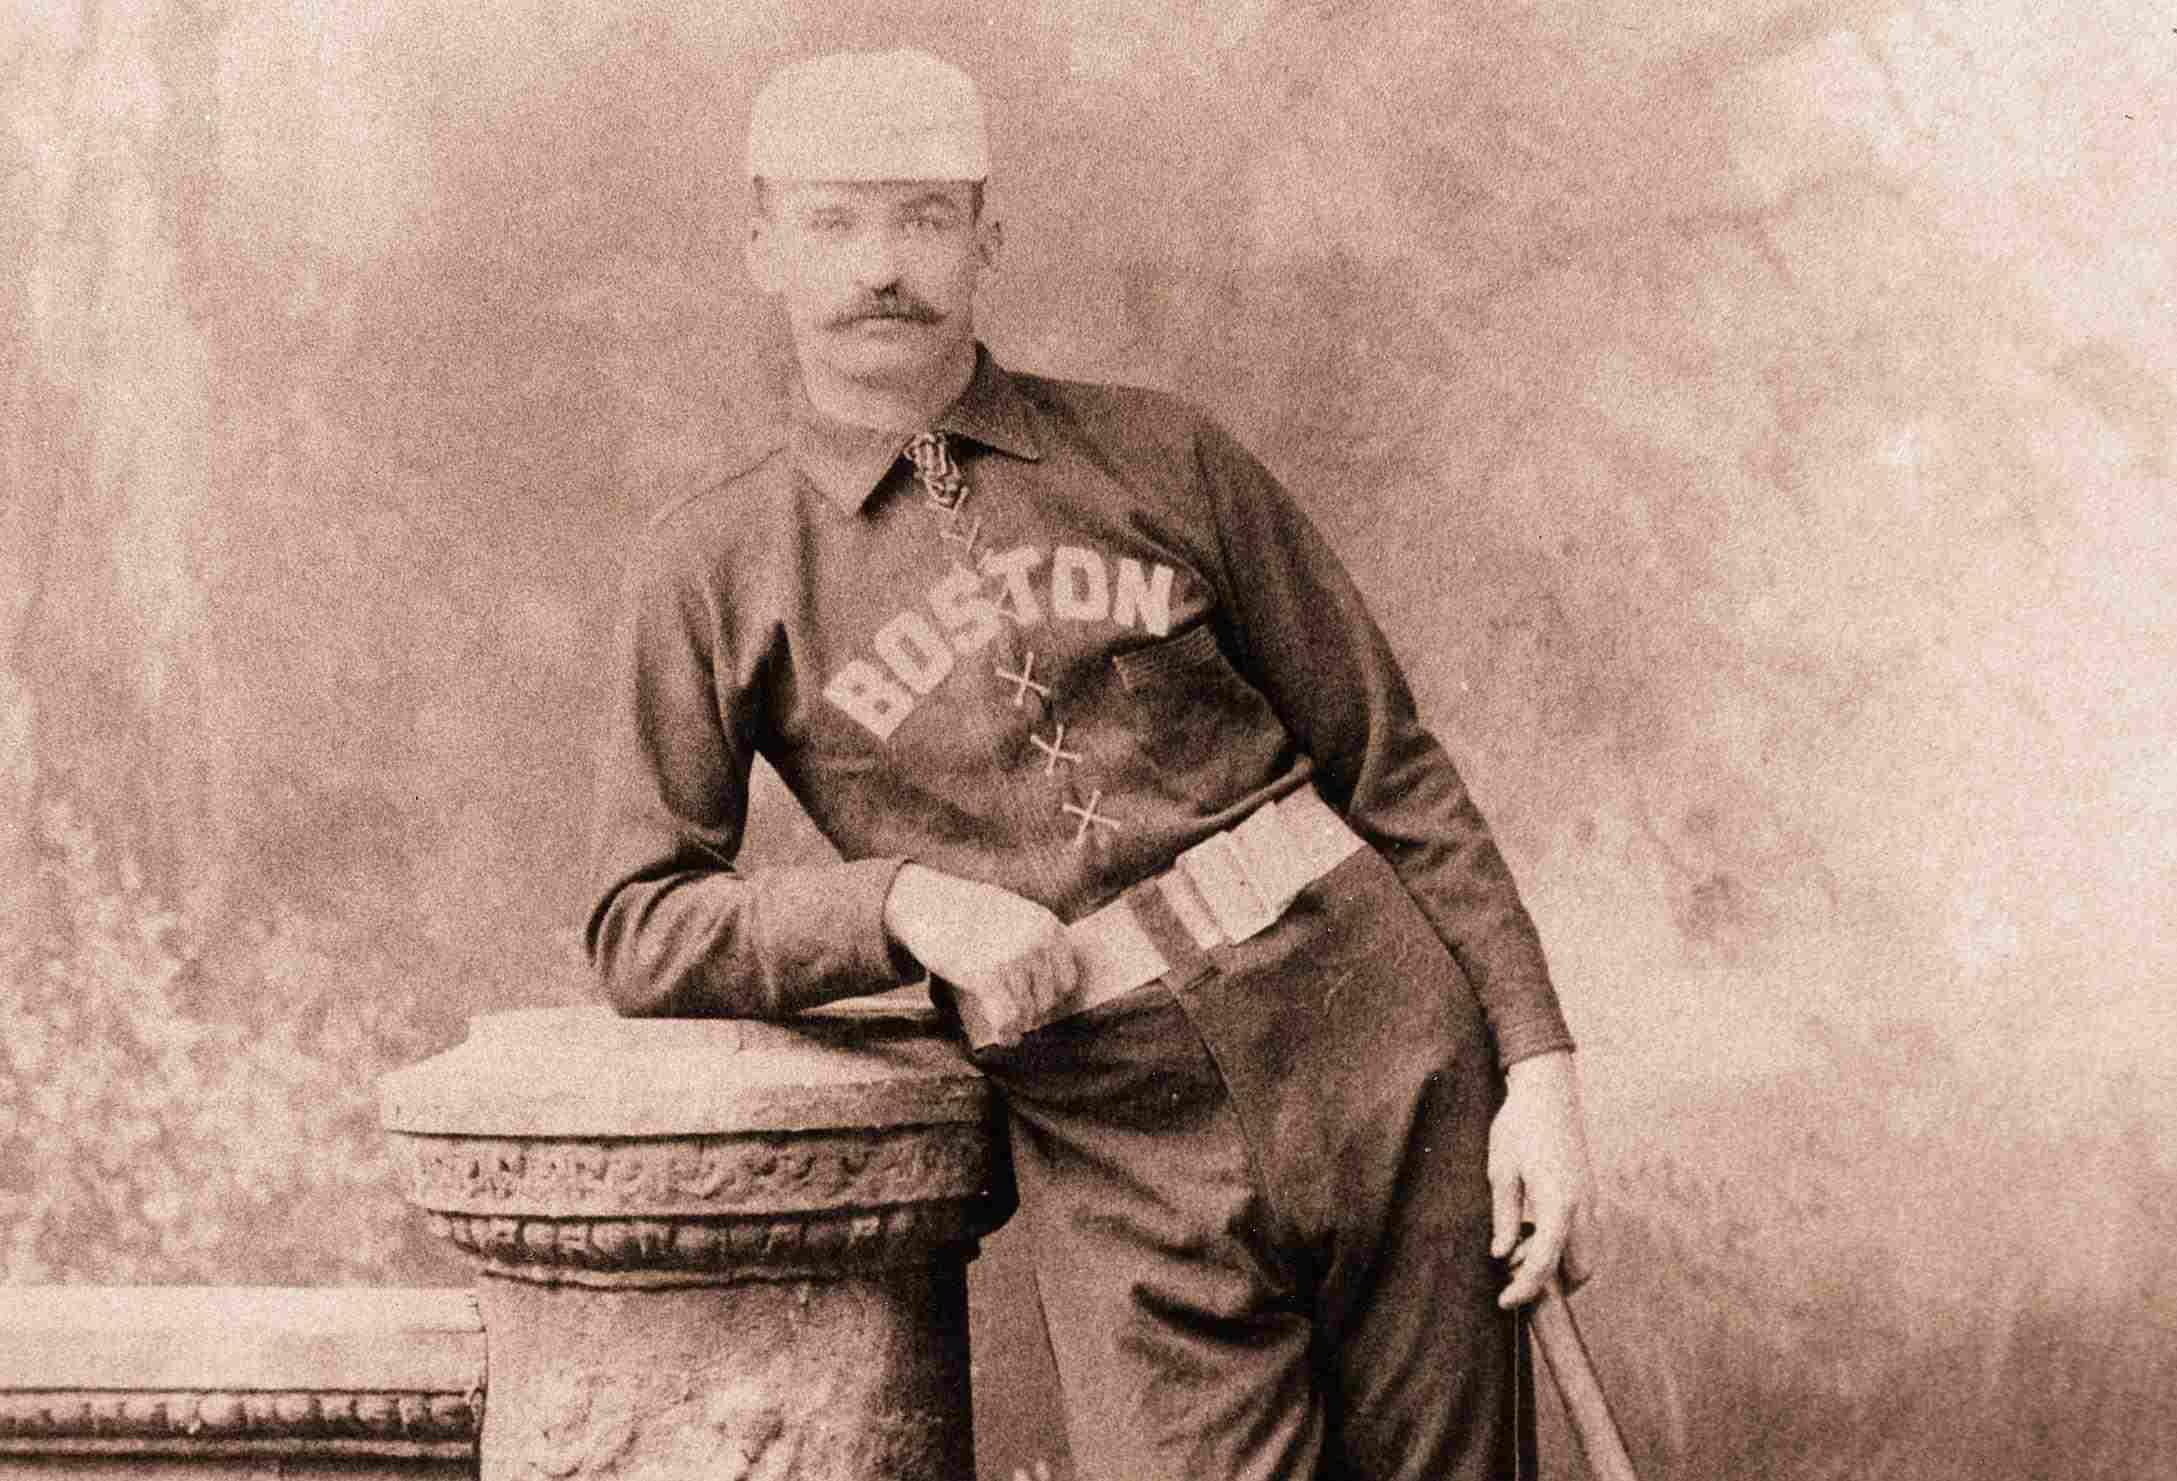 19th century baseball player King Kelly